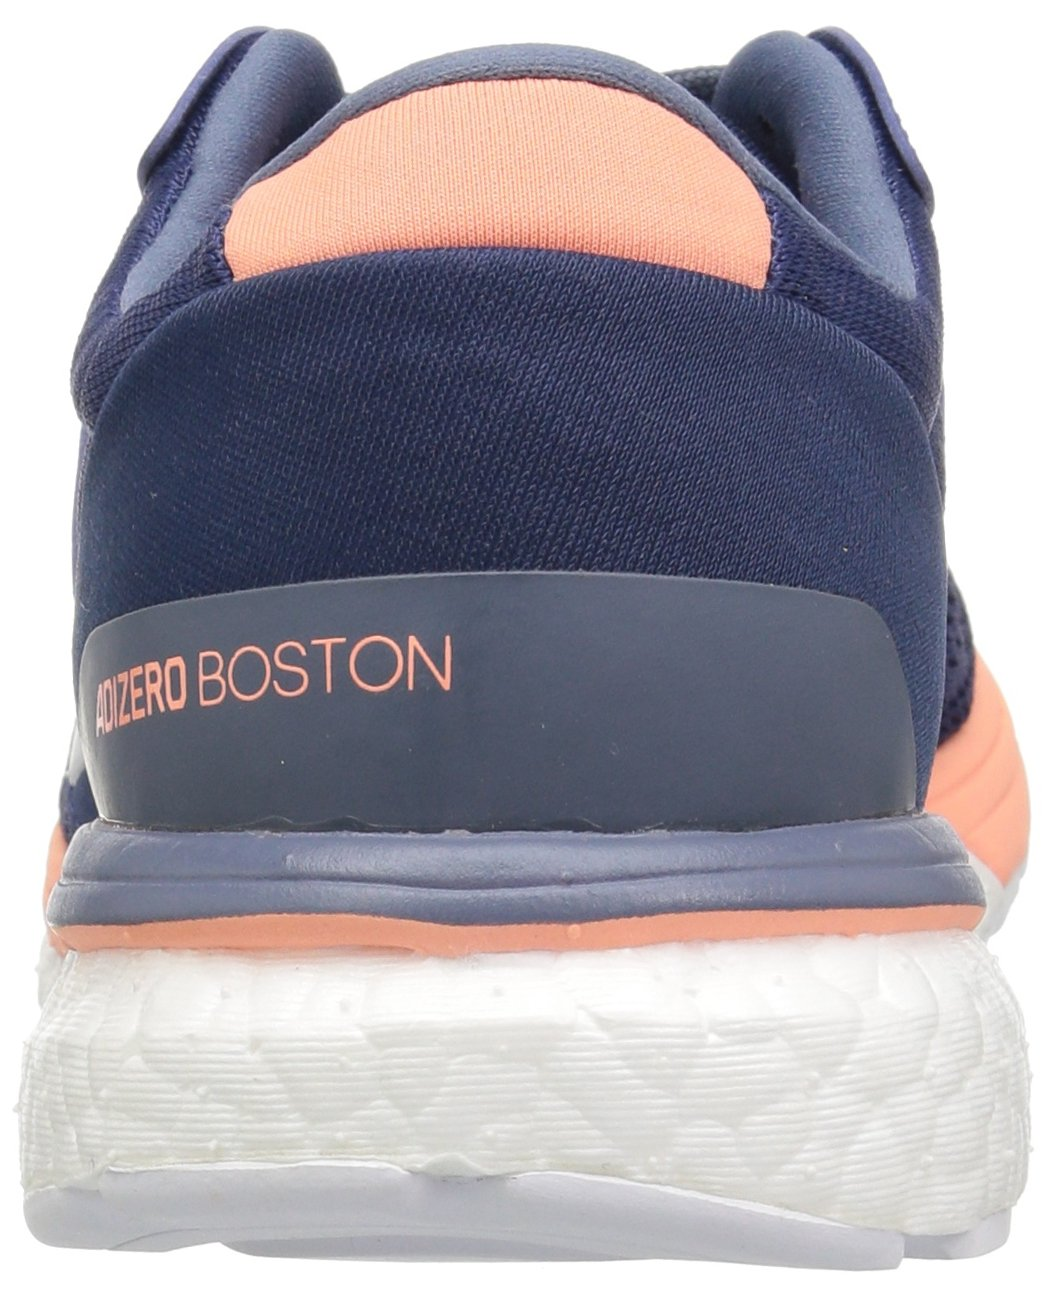 adidas 7.5 Women's Adizero Boston 6 W Running Shoe B072FGWSWG 7.5 adidas B(M) US|Noble Indigo/White/Raw Steel 38f782